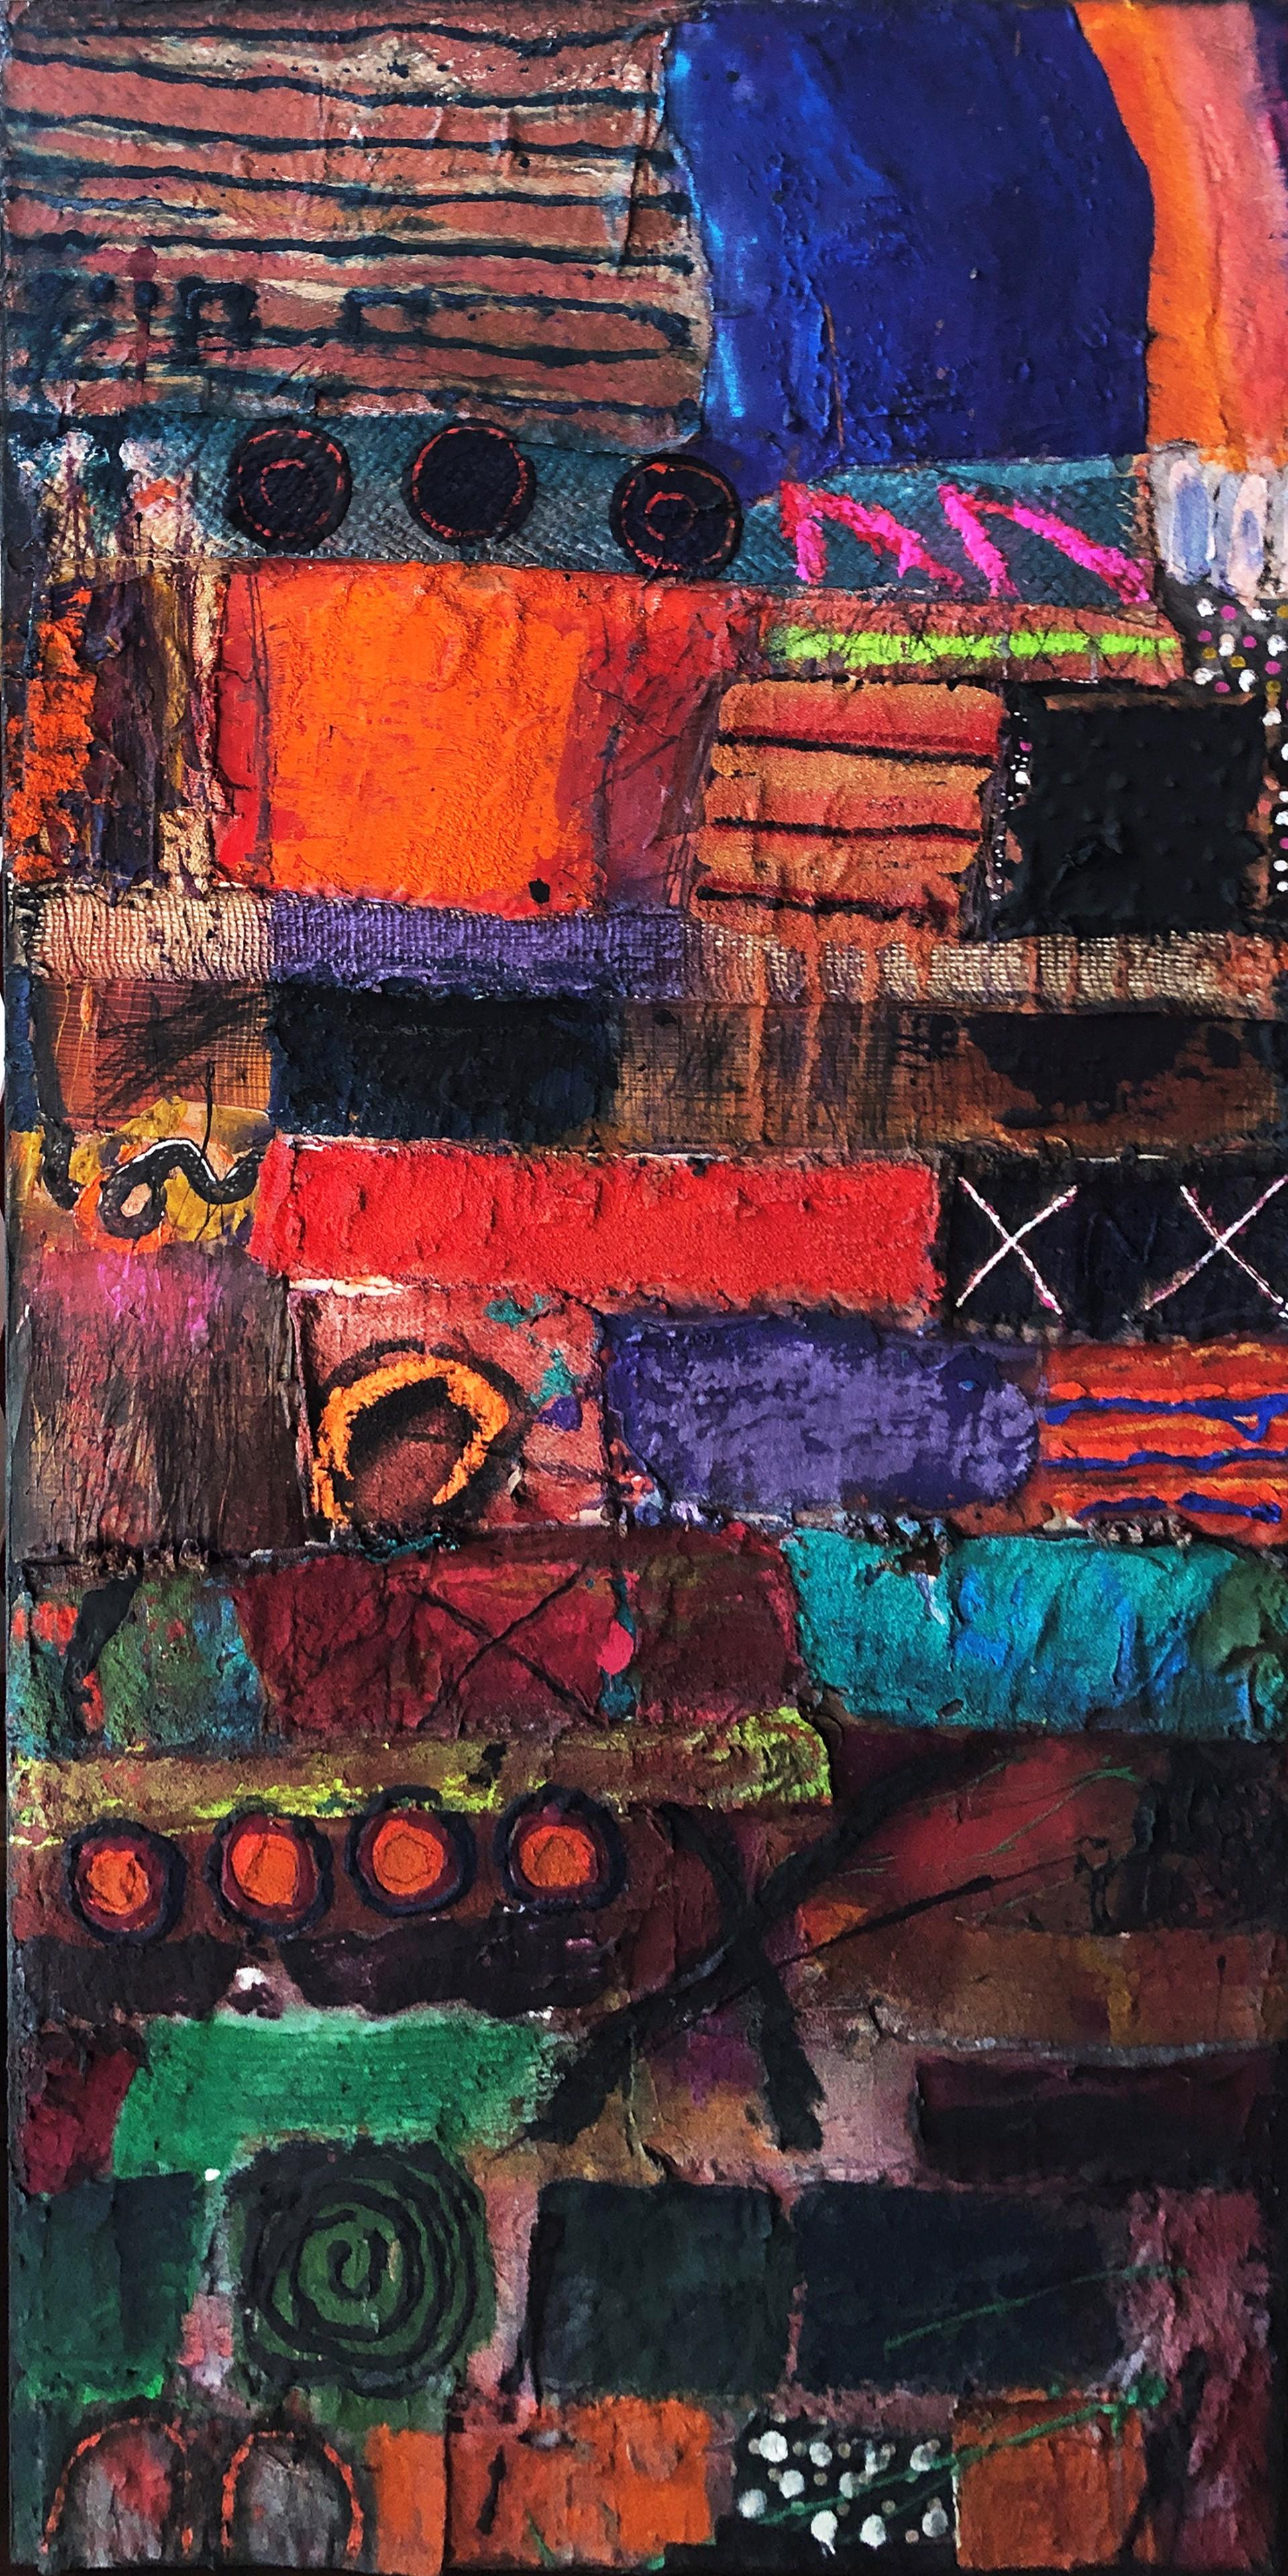 Gem 2 by Dick Jemison